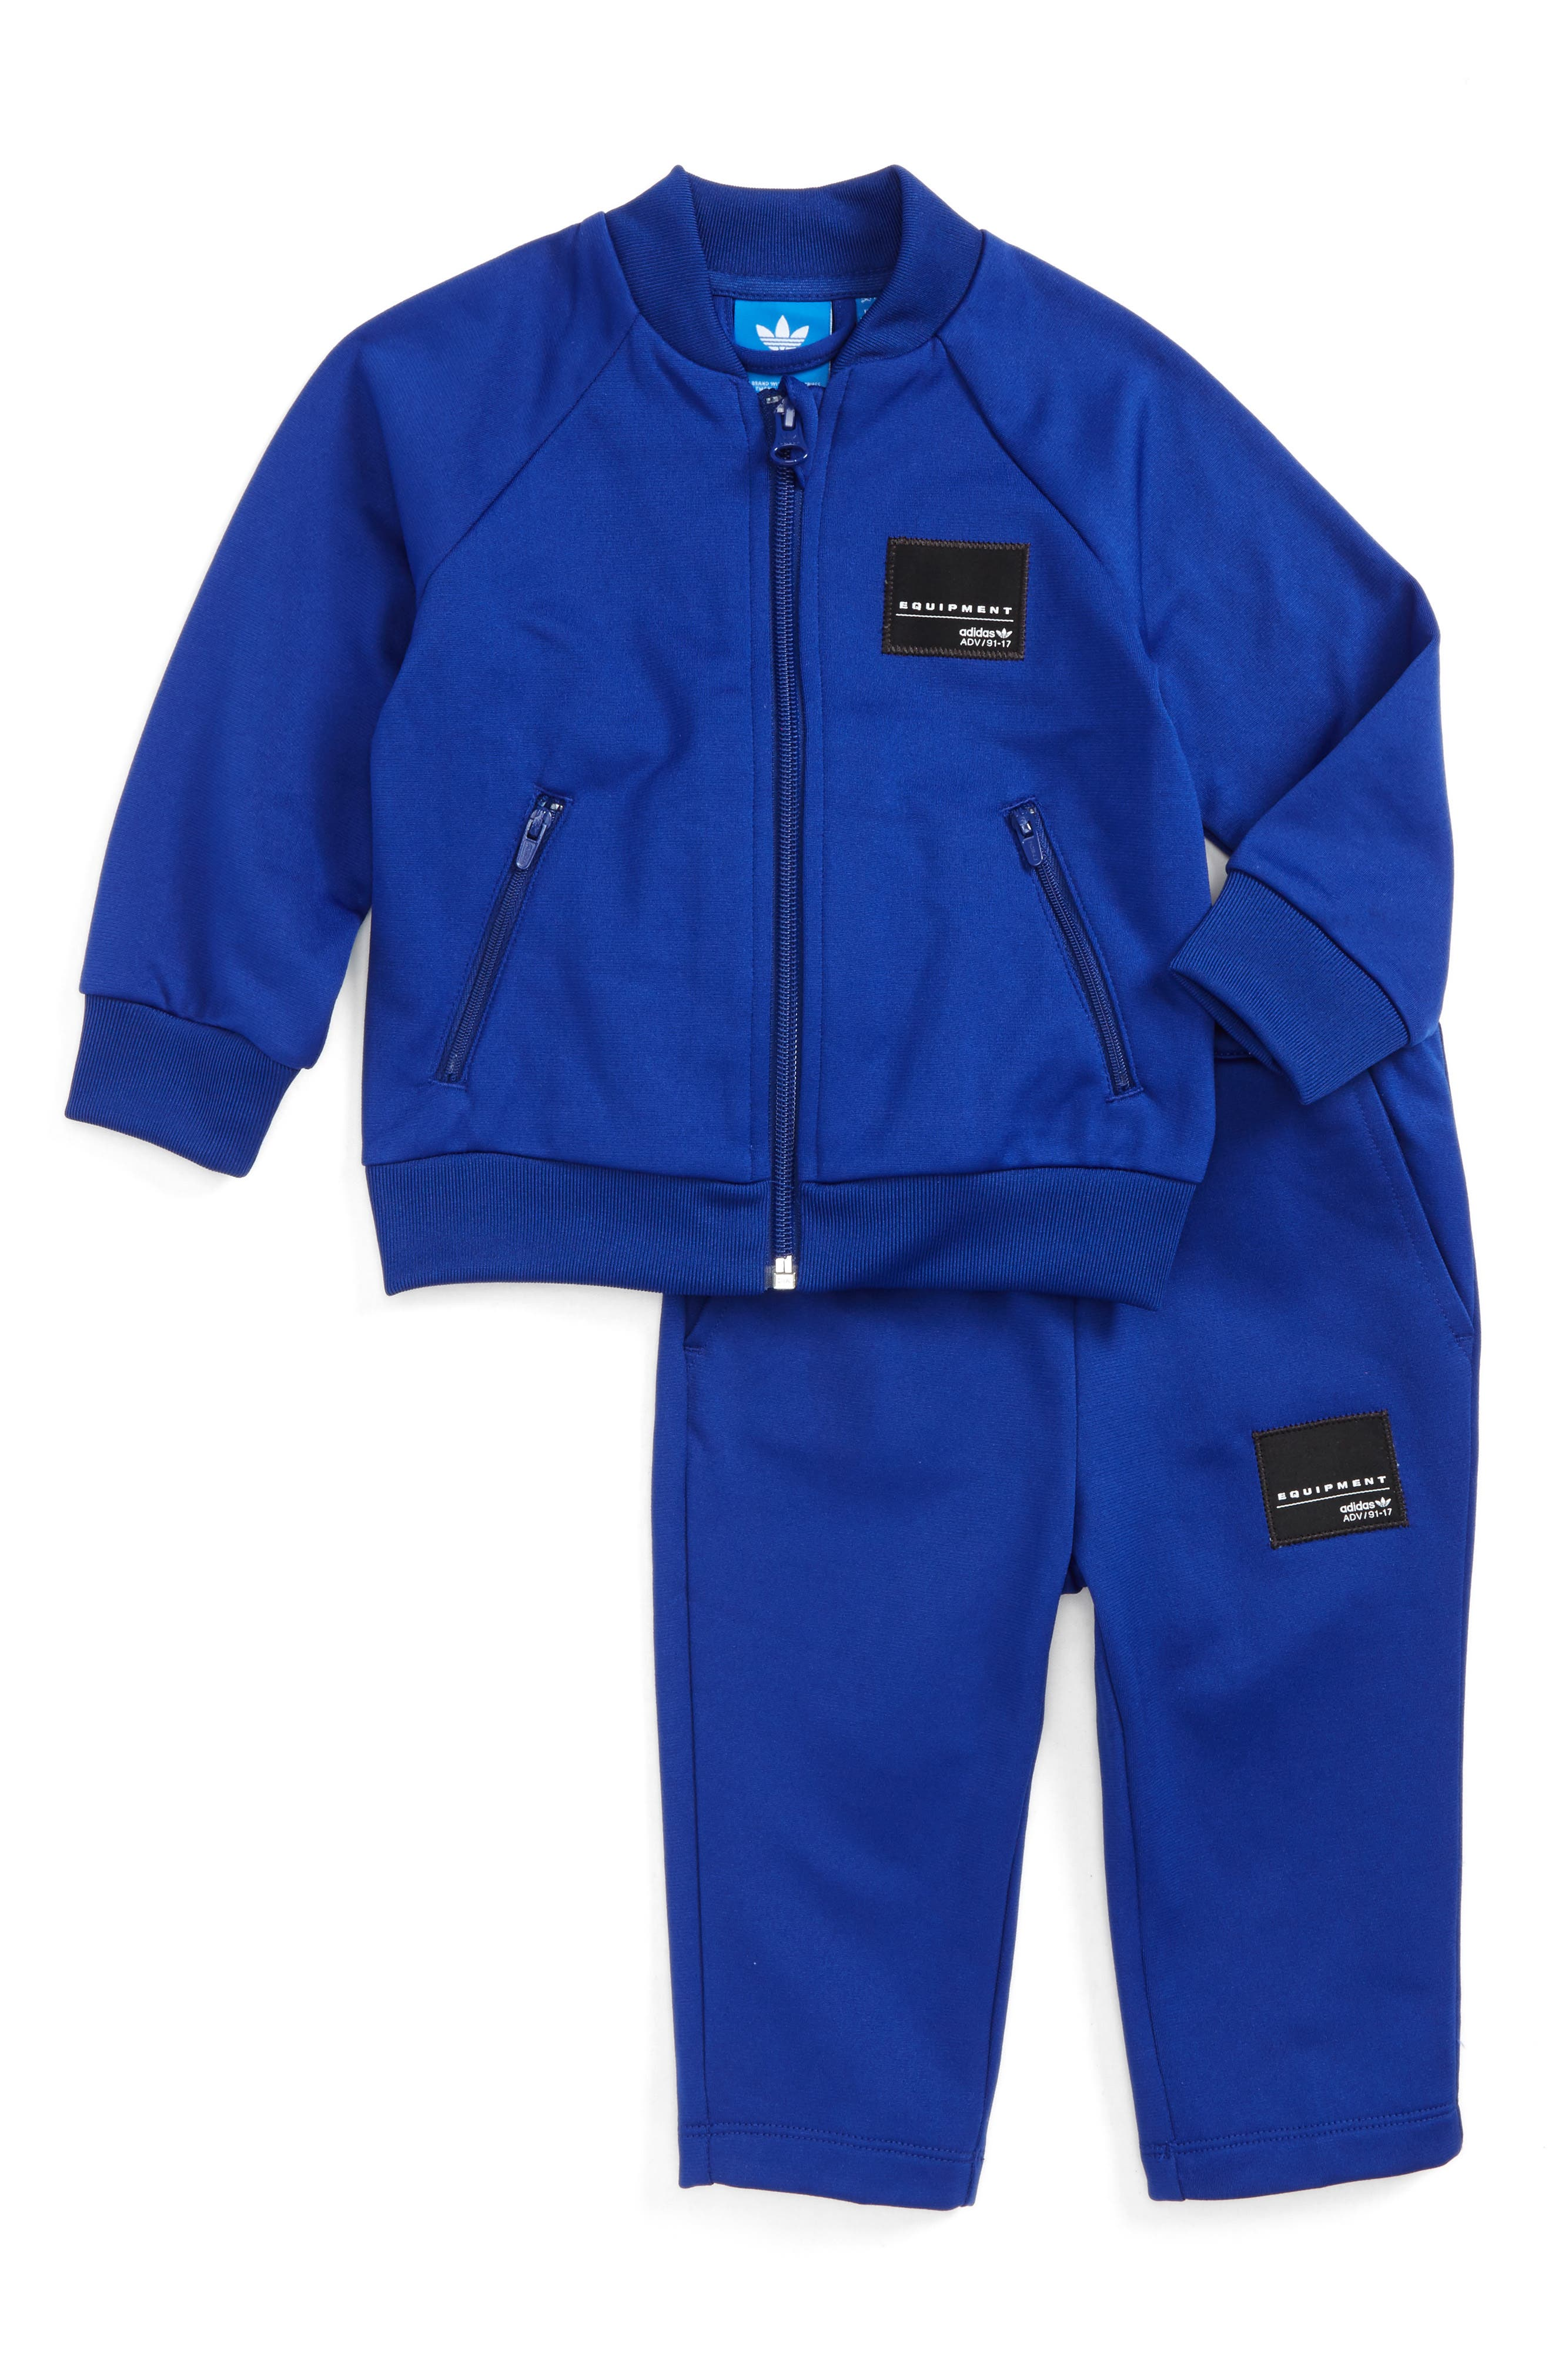 Main Image - adidas Originals EQT Superstar Jacket & Pants Set (Baby)